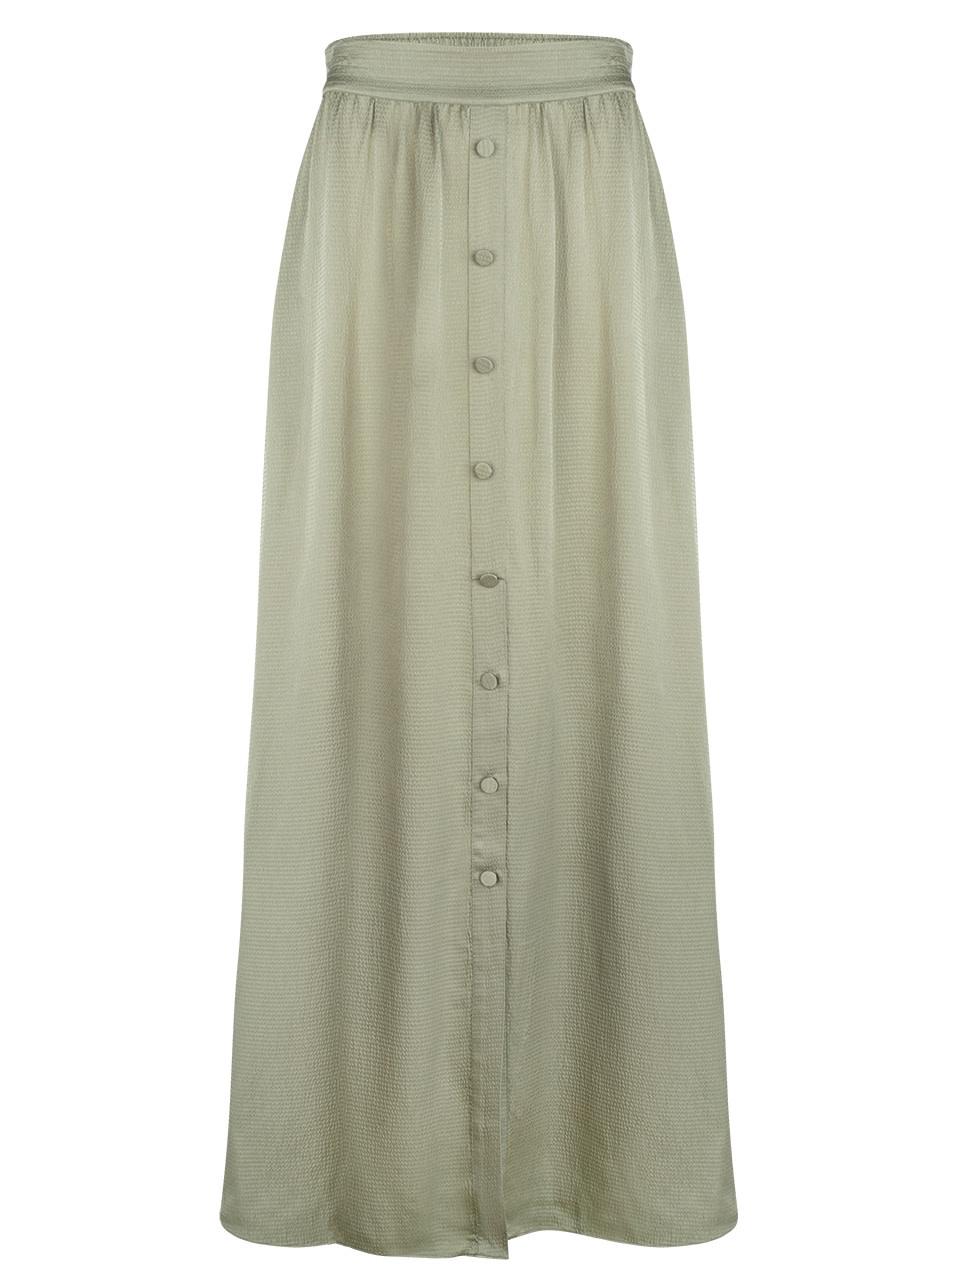 cooper long skirt sage green-1